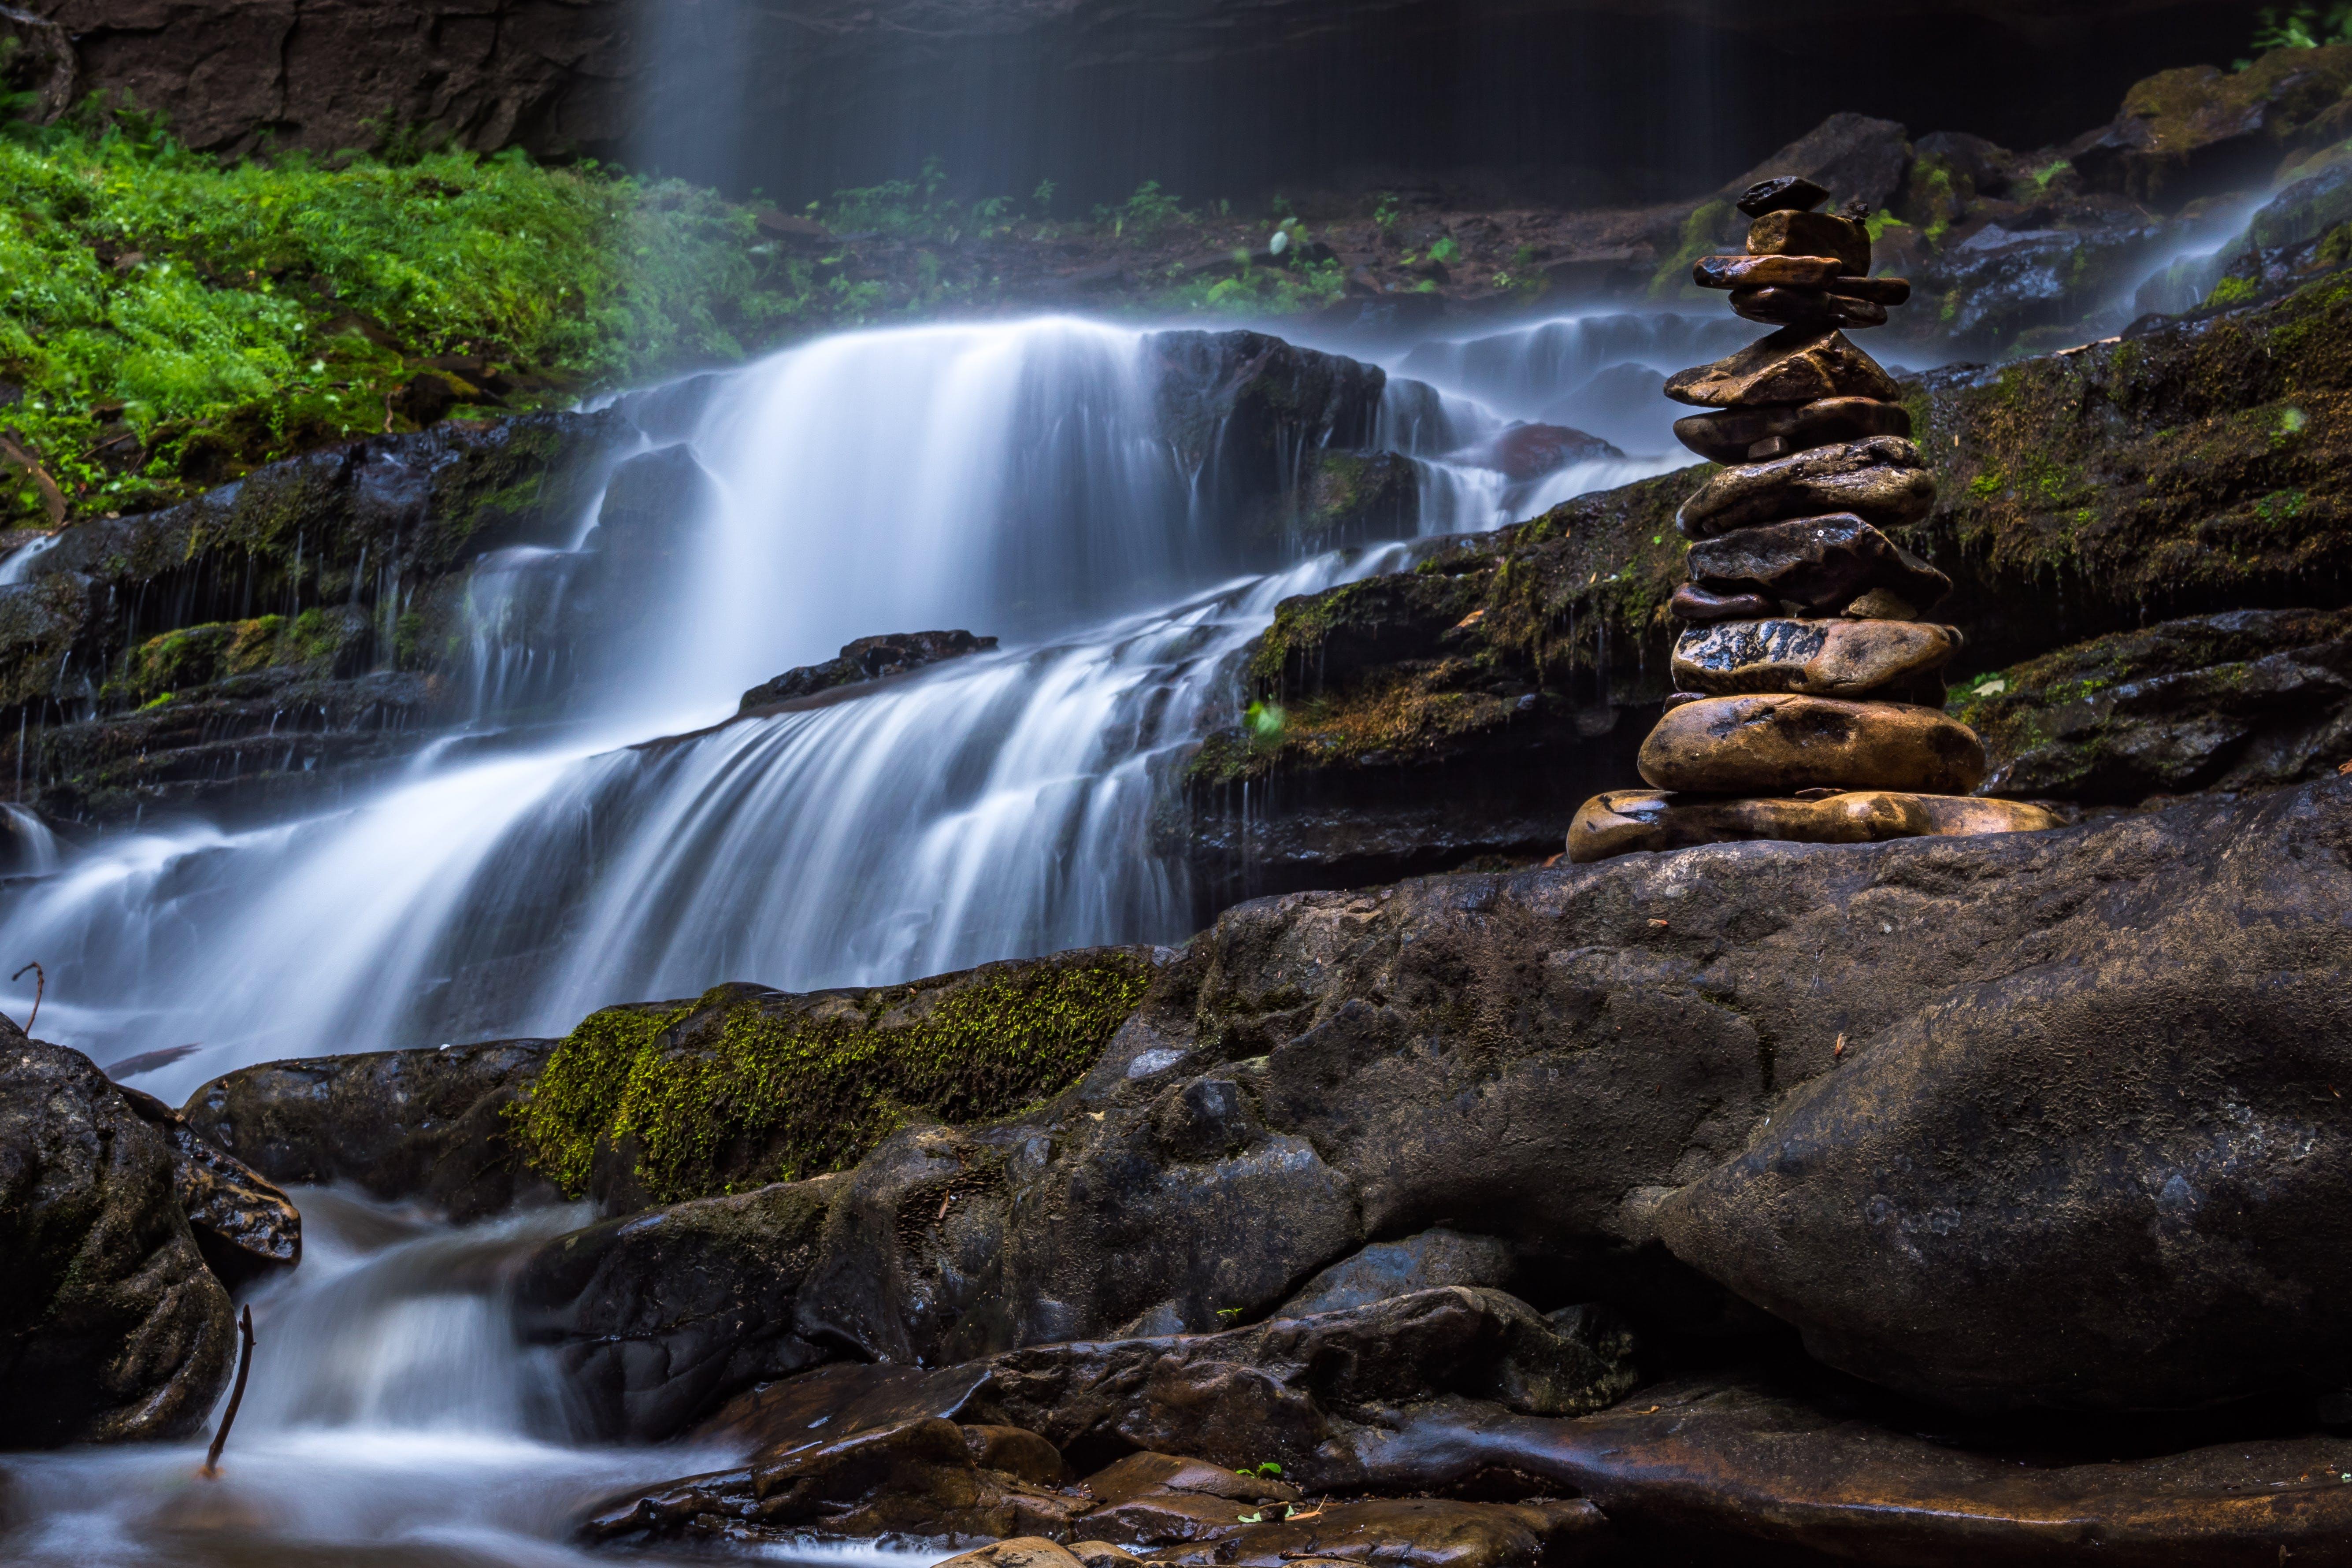 Balancing Stones on Waterfalls